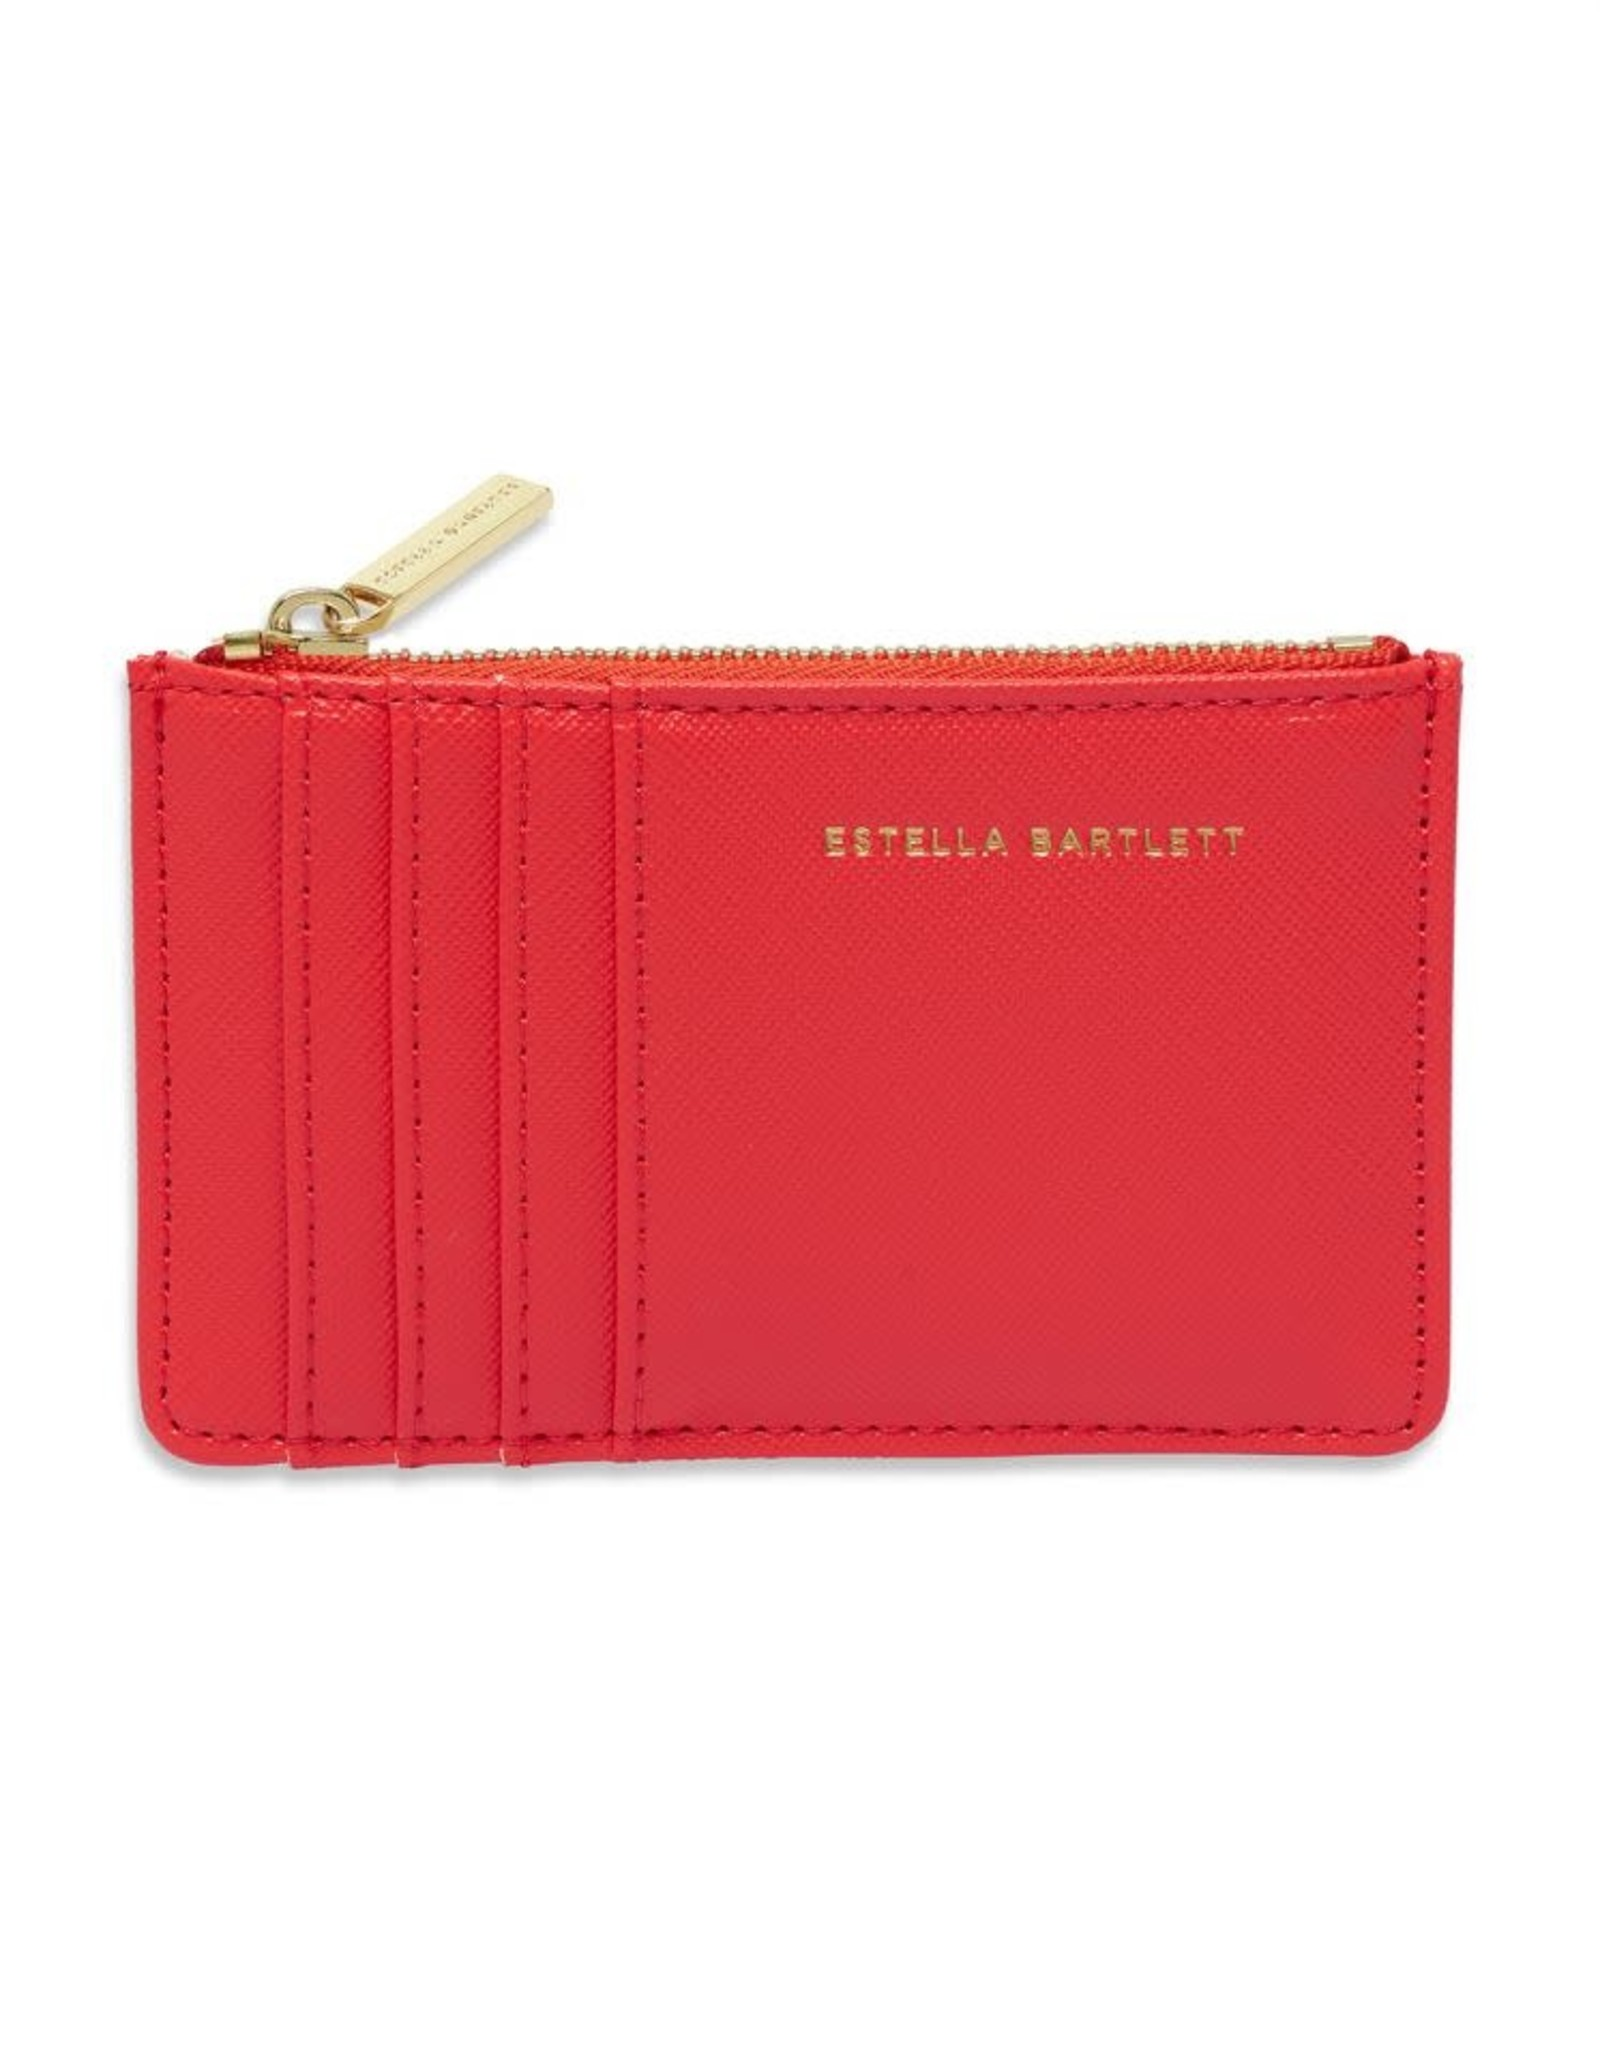 Estella Barlett Card Purse